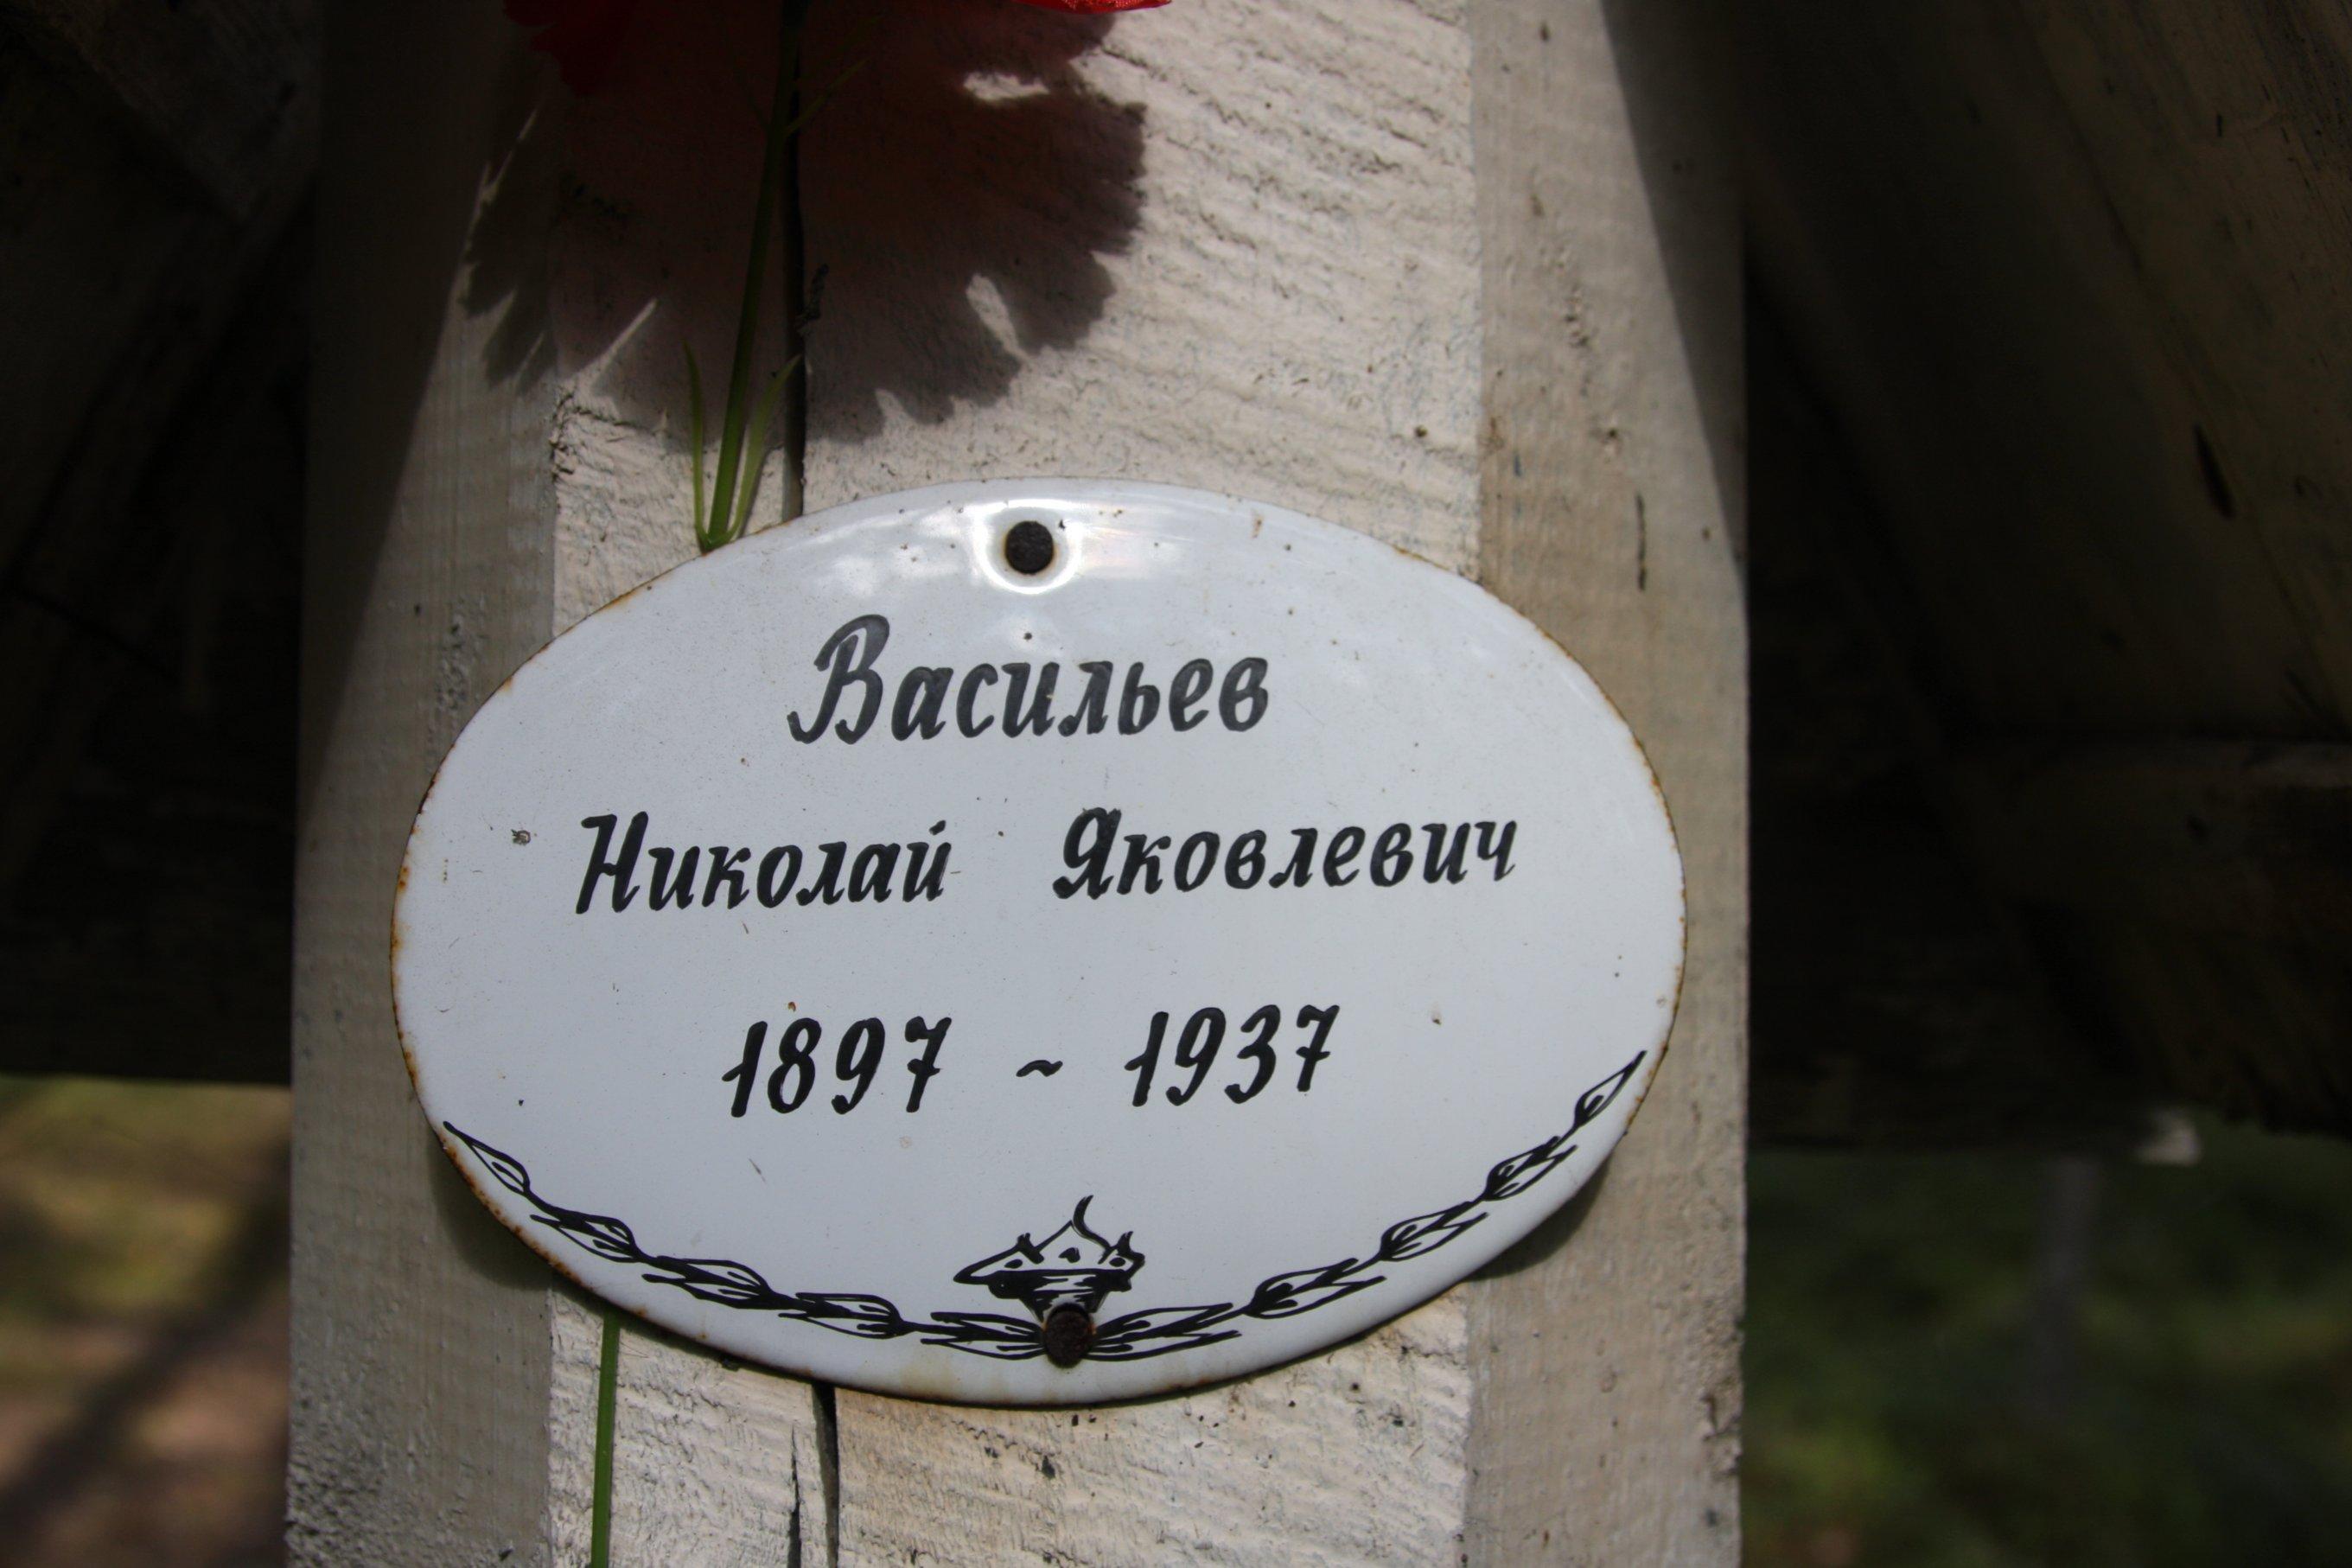 Памятная табличка «Васильев Николай Яковлевич». Фото 04.08.2018.